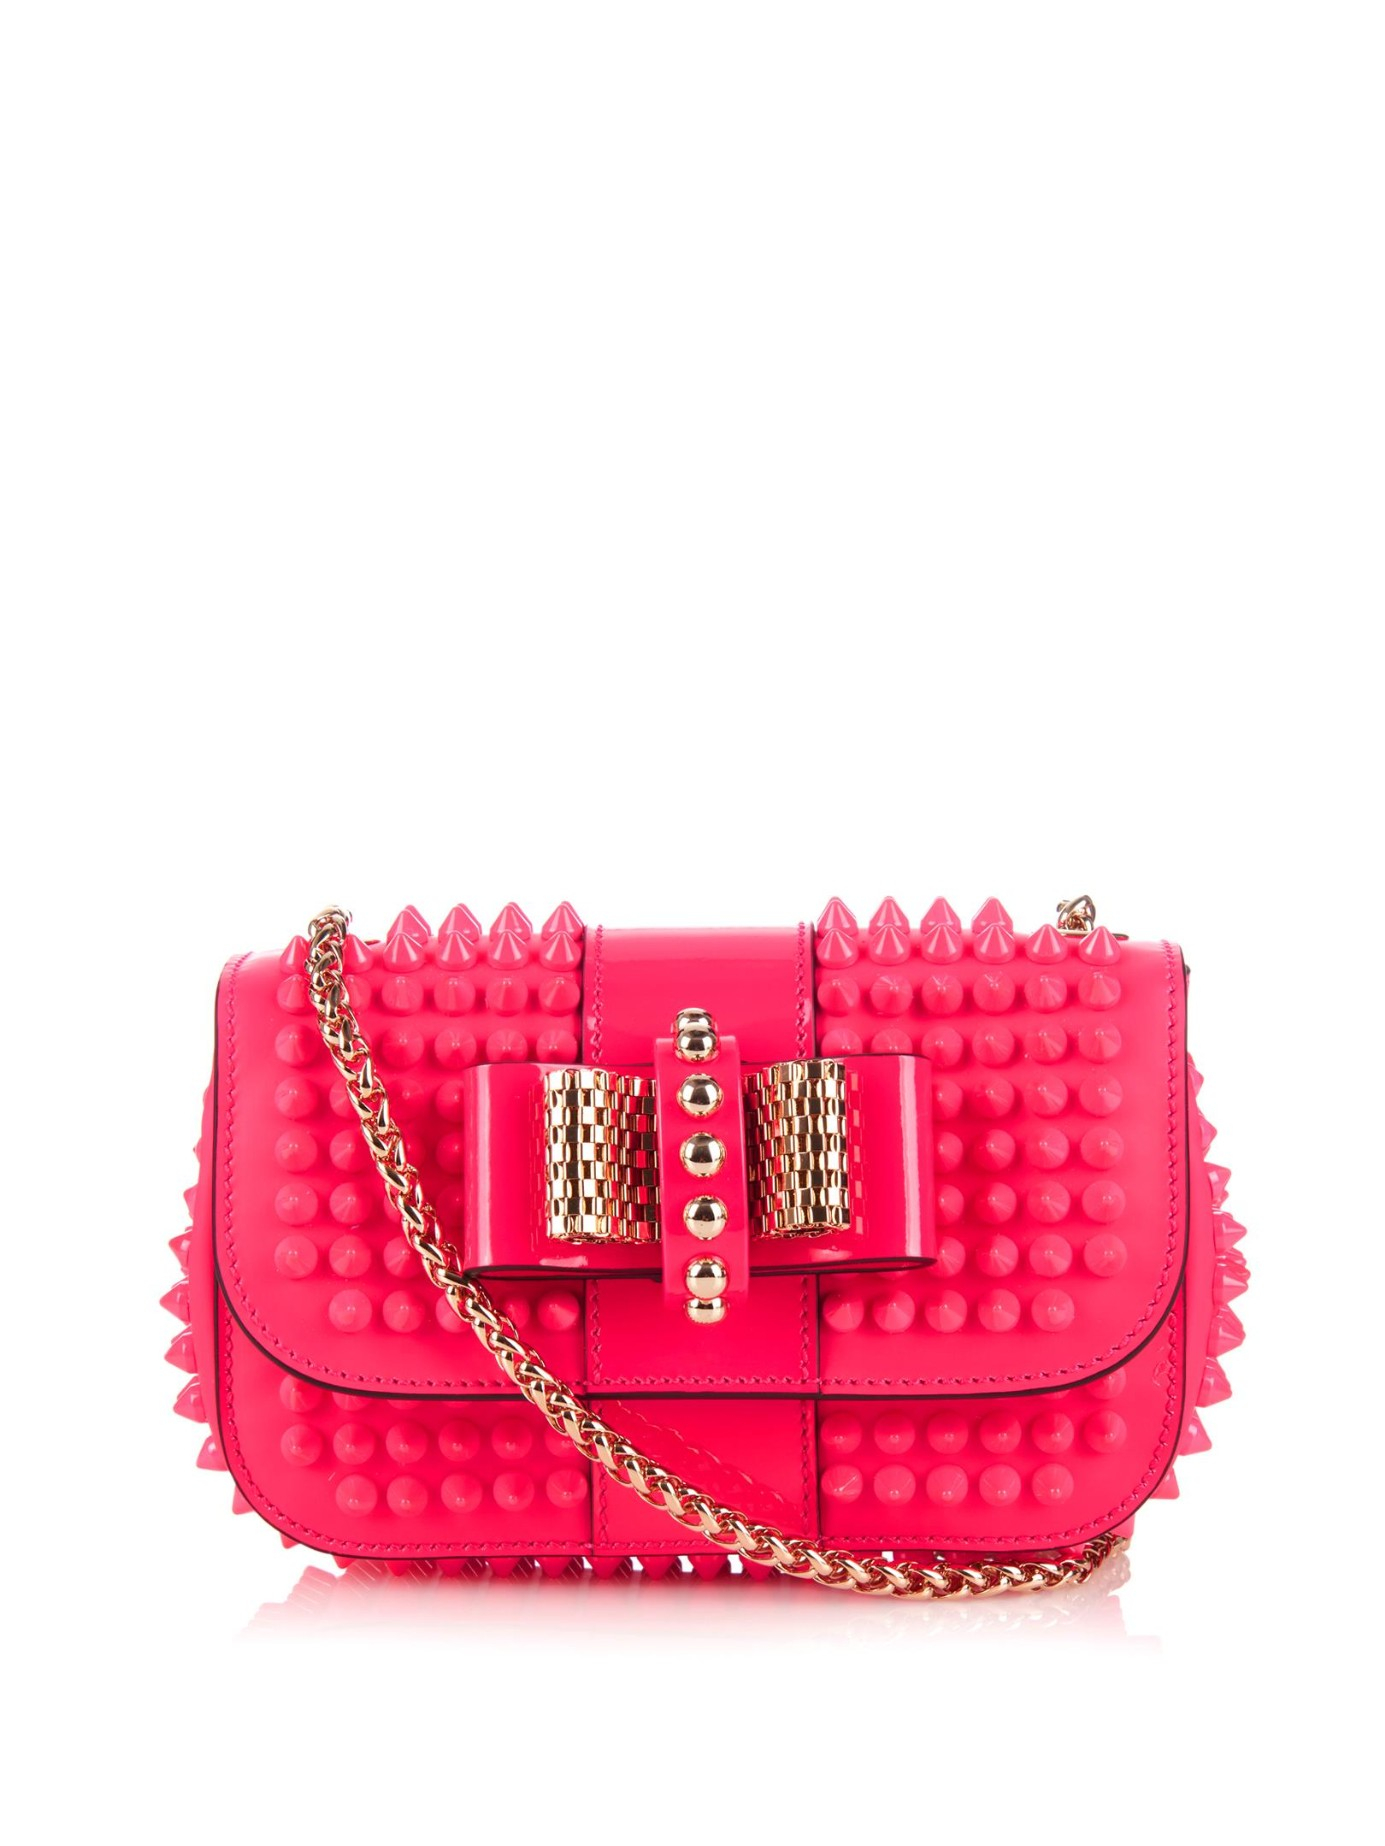 a8f2b25bf15 Christian Louboutin Pink Sweety Charity Mini Leather Shoulder Bag